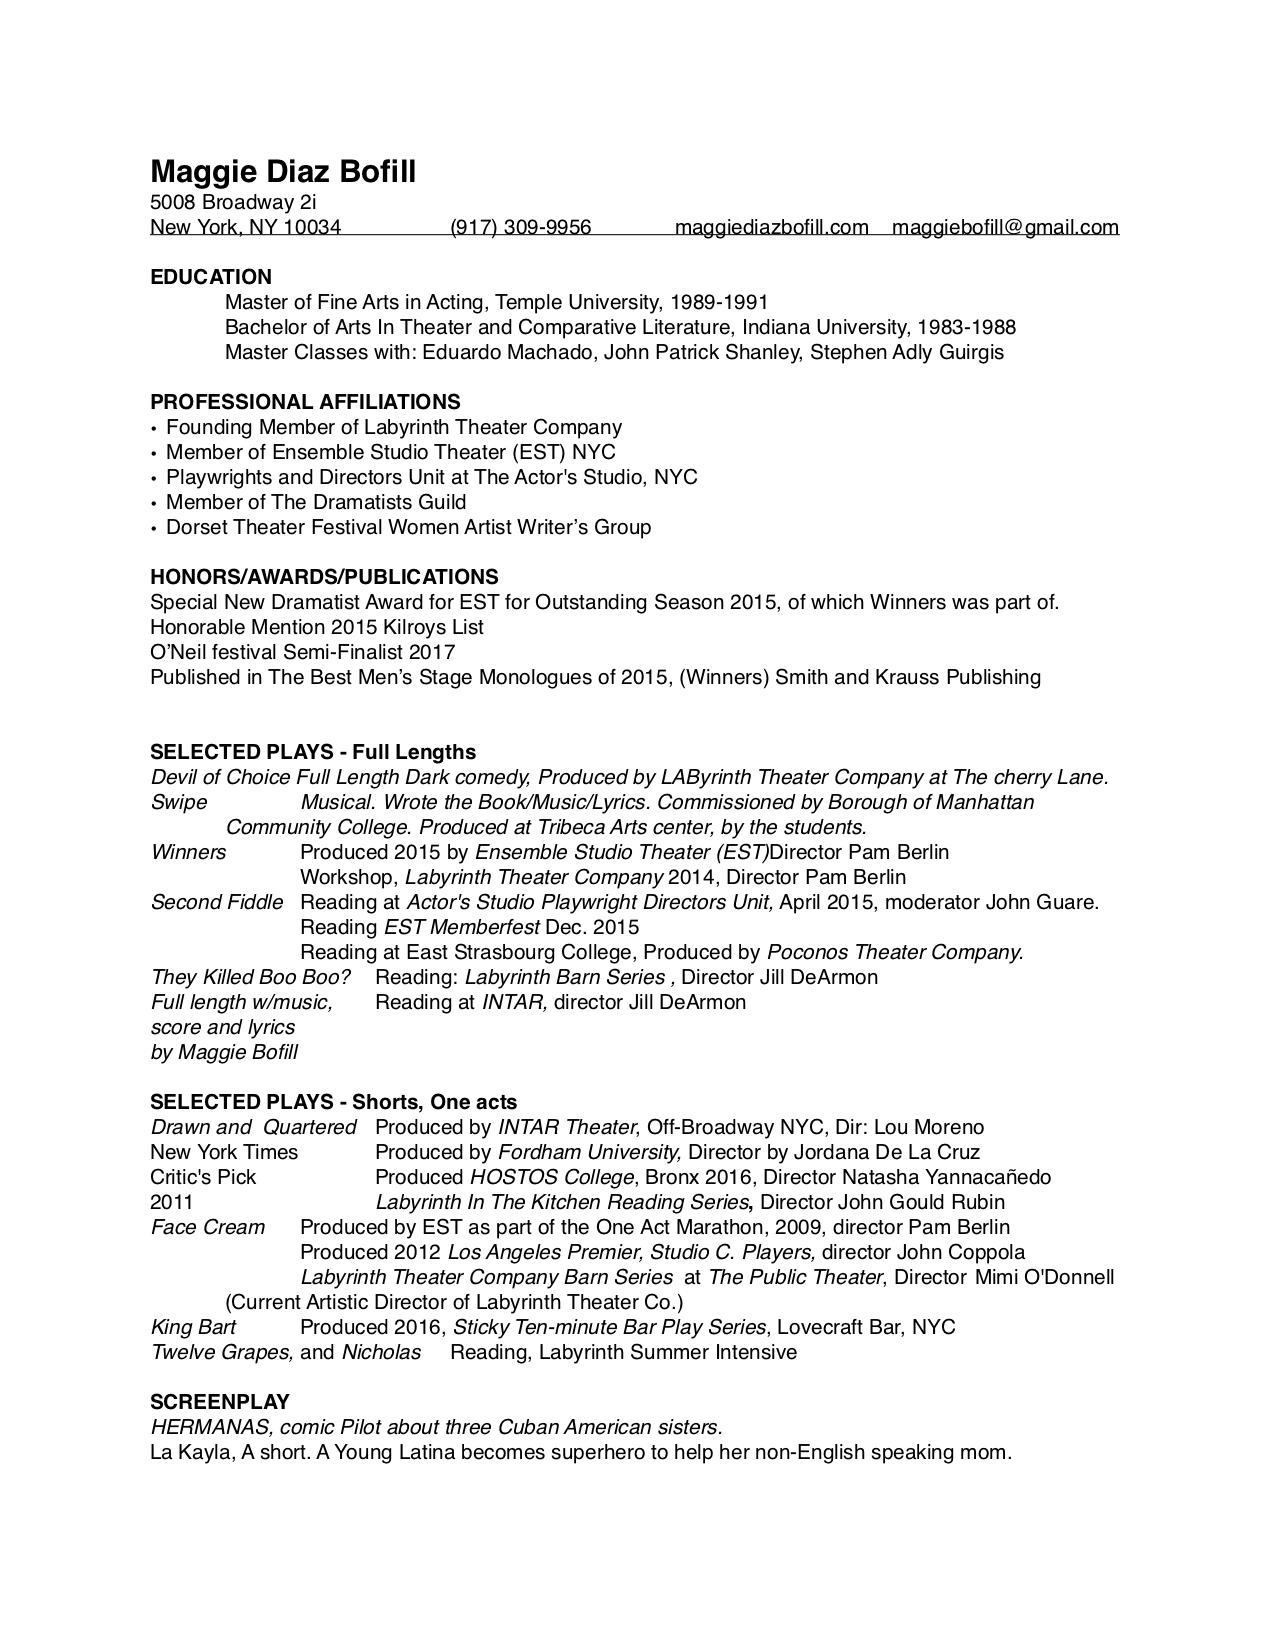 Writer Resume.jpg